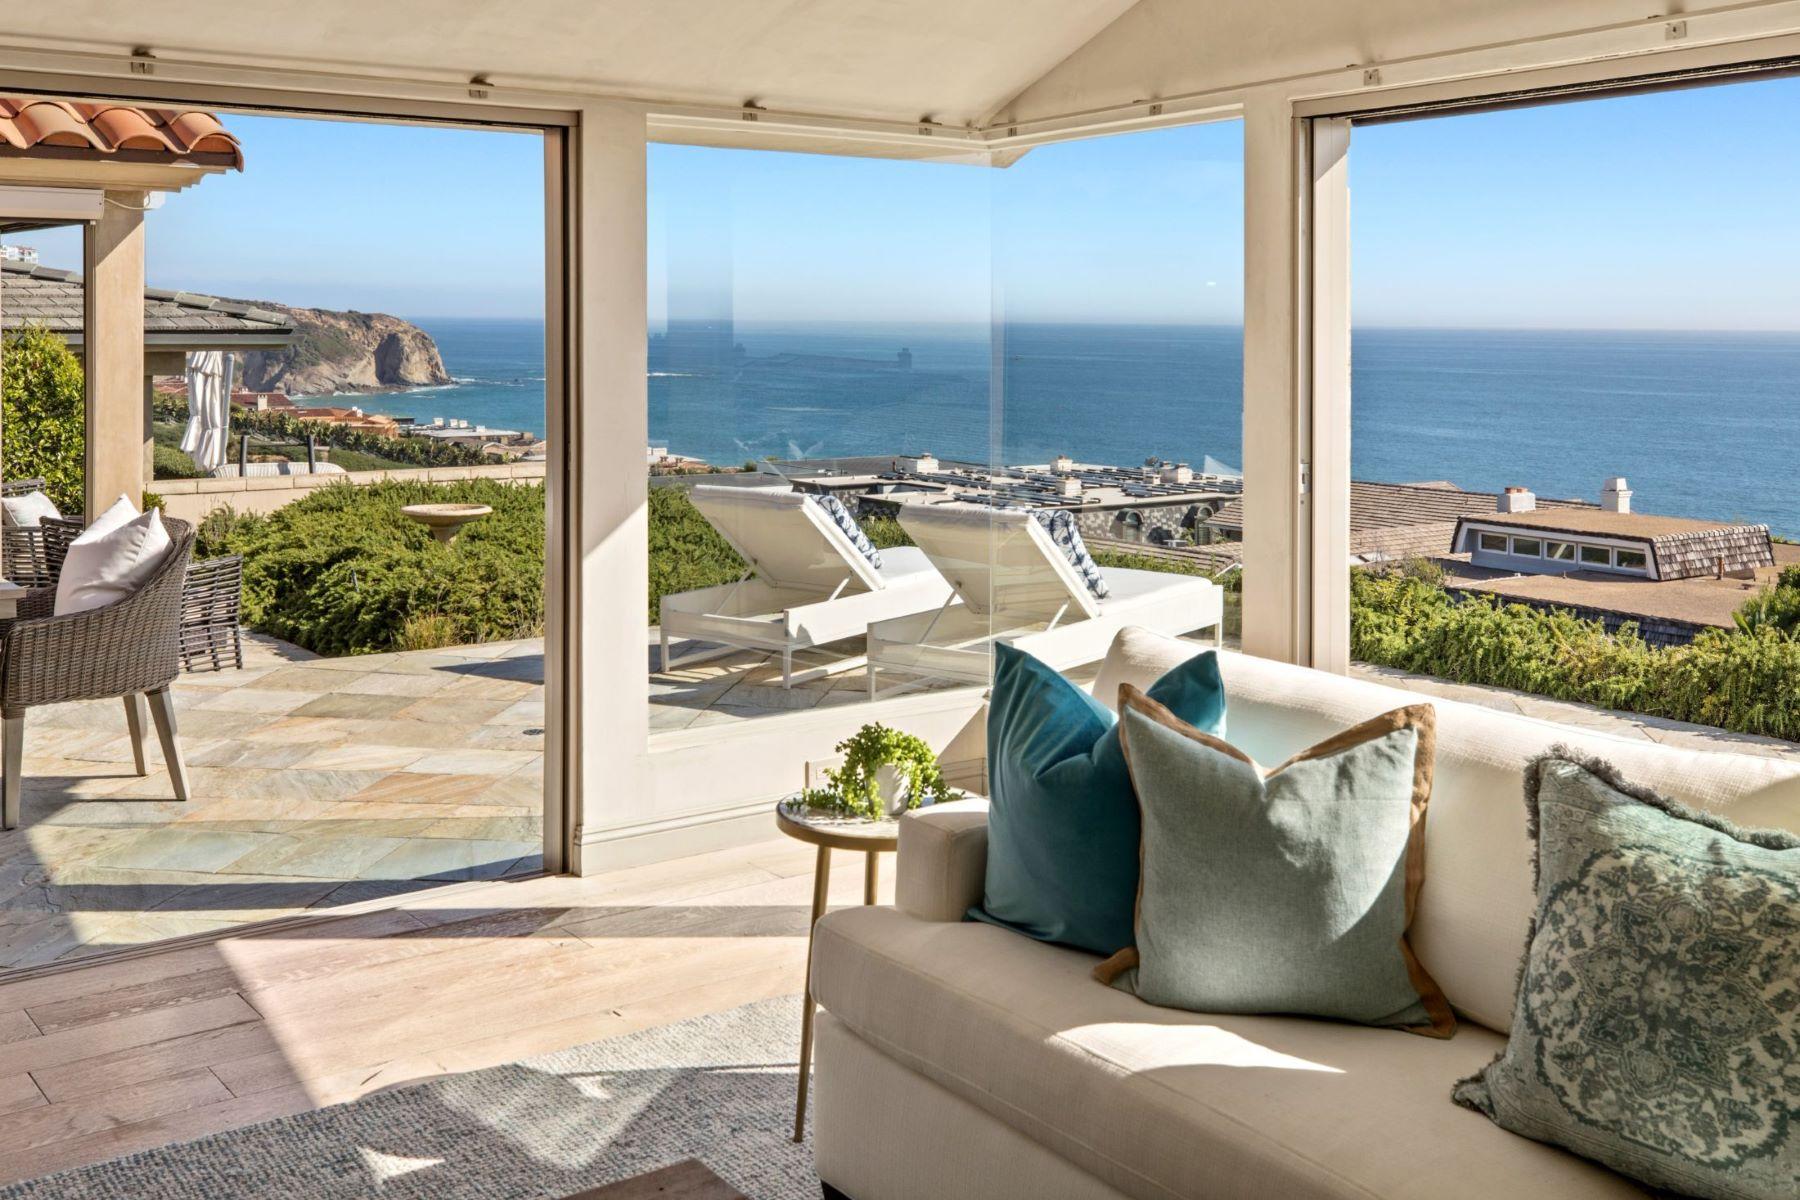 Single Family Homes for Sale at 33821 Shackleton Isle Dana Point, California 92629 United States